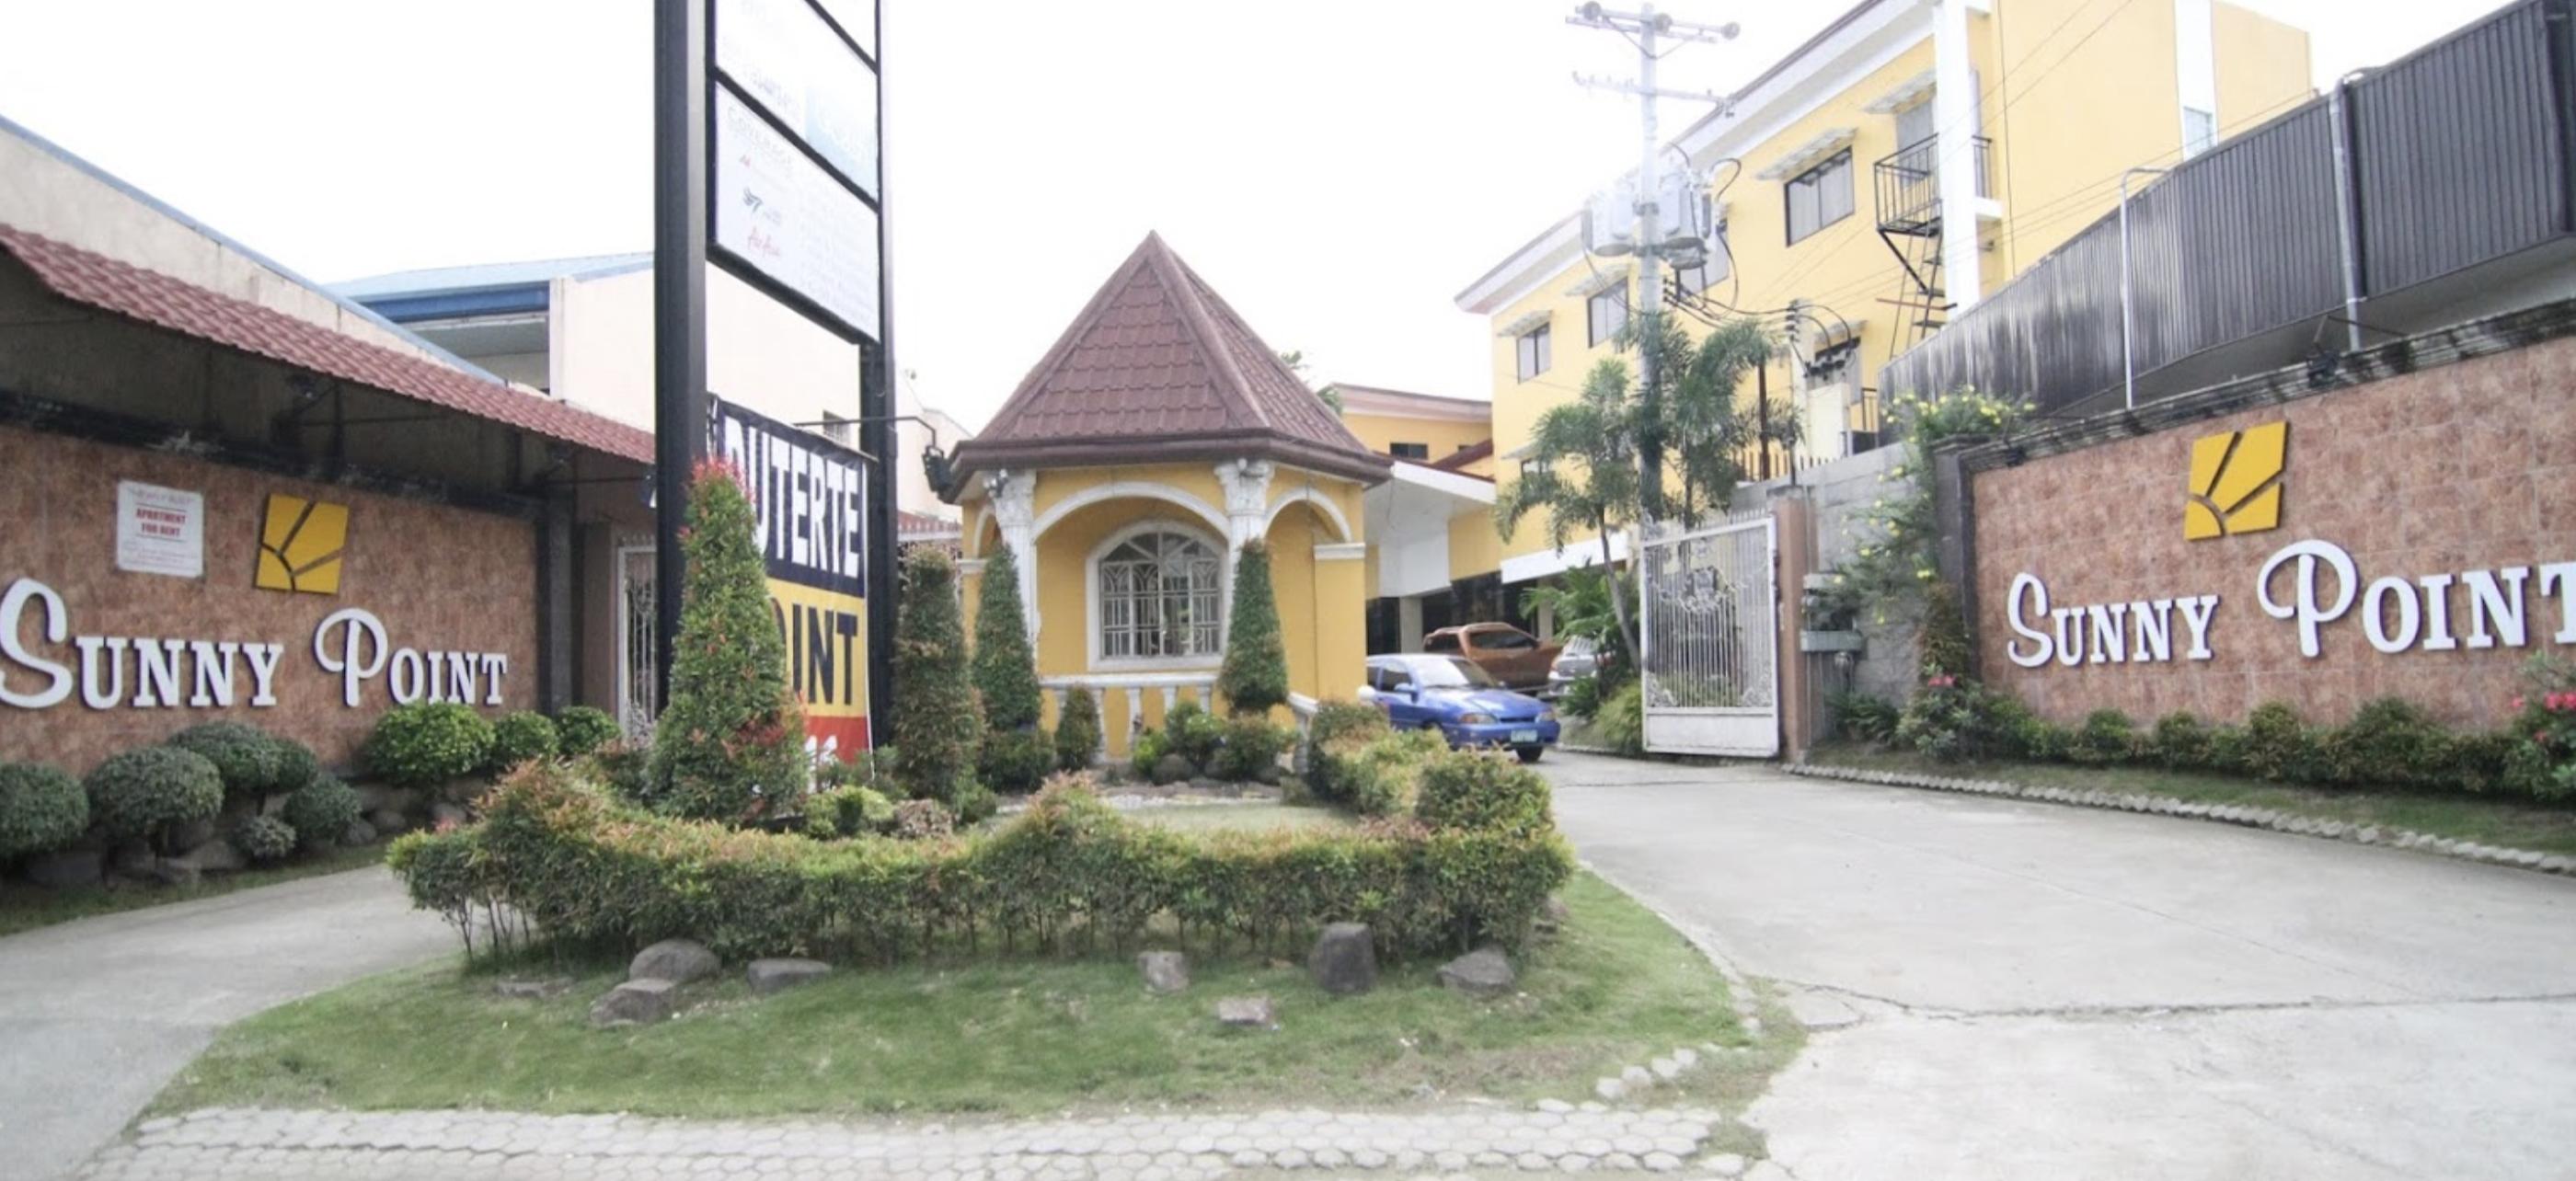 https://tourism.davaocity.gov.ph/wp-content/uploads/2019/12/Screen-Shot-2019-12-19-at-11.12.17-AM.png